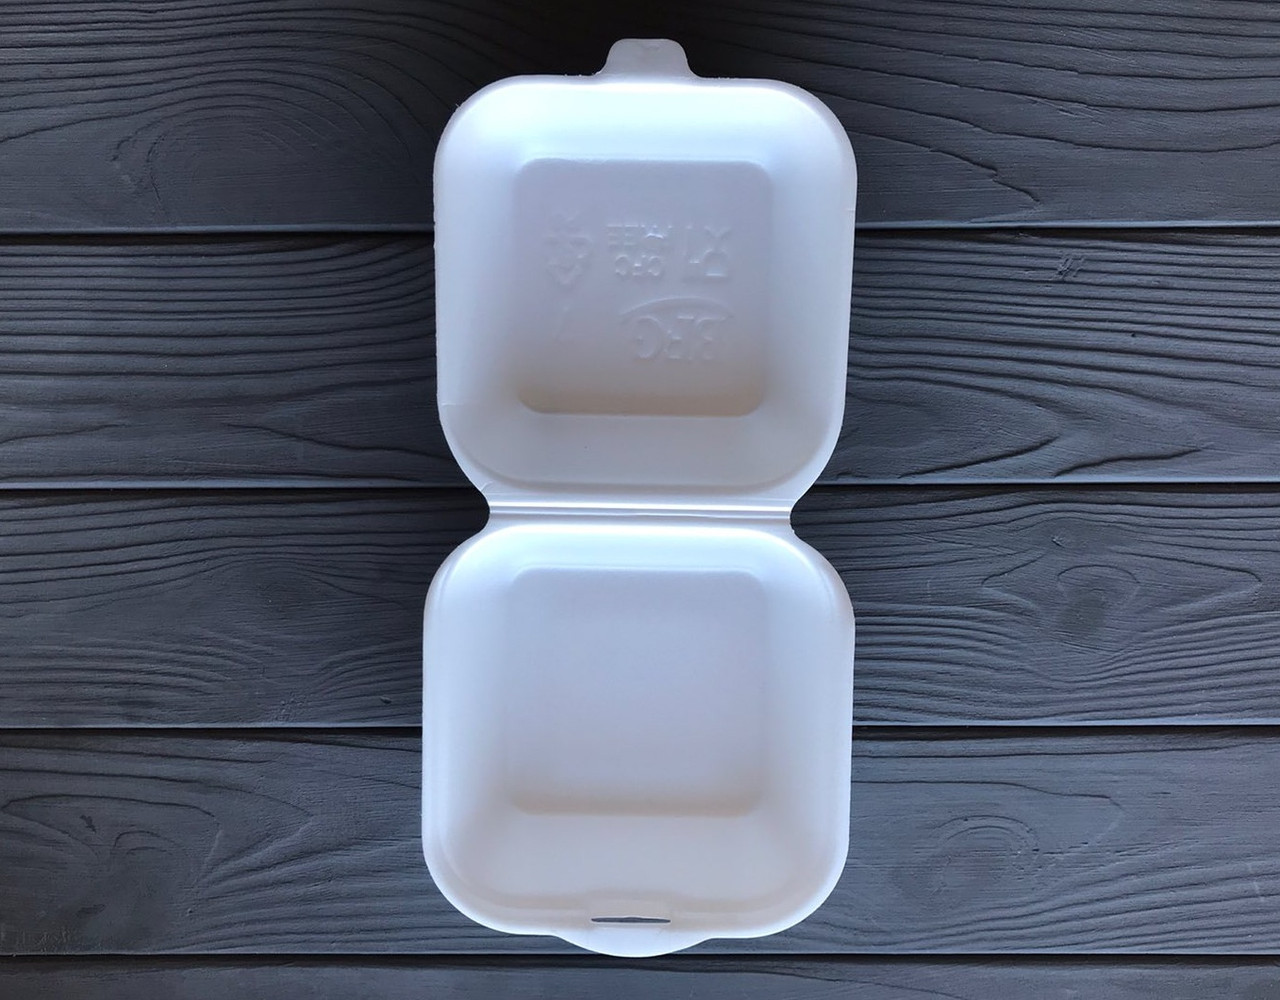 Ланч-бокс одноразовый белый HB7 135x135x70 мм